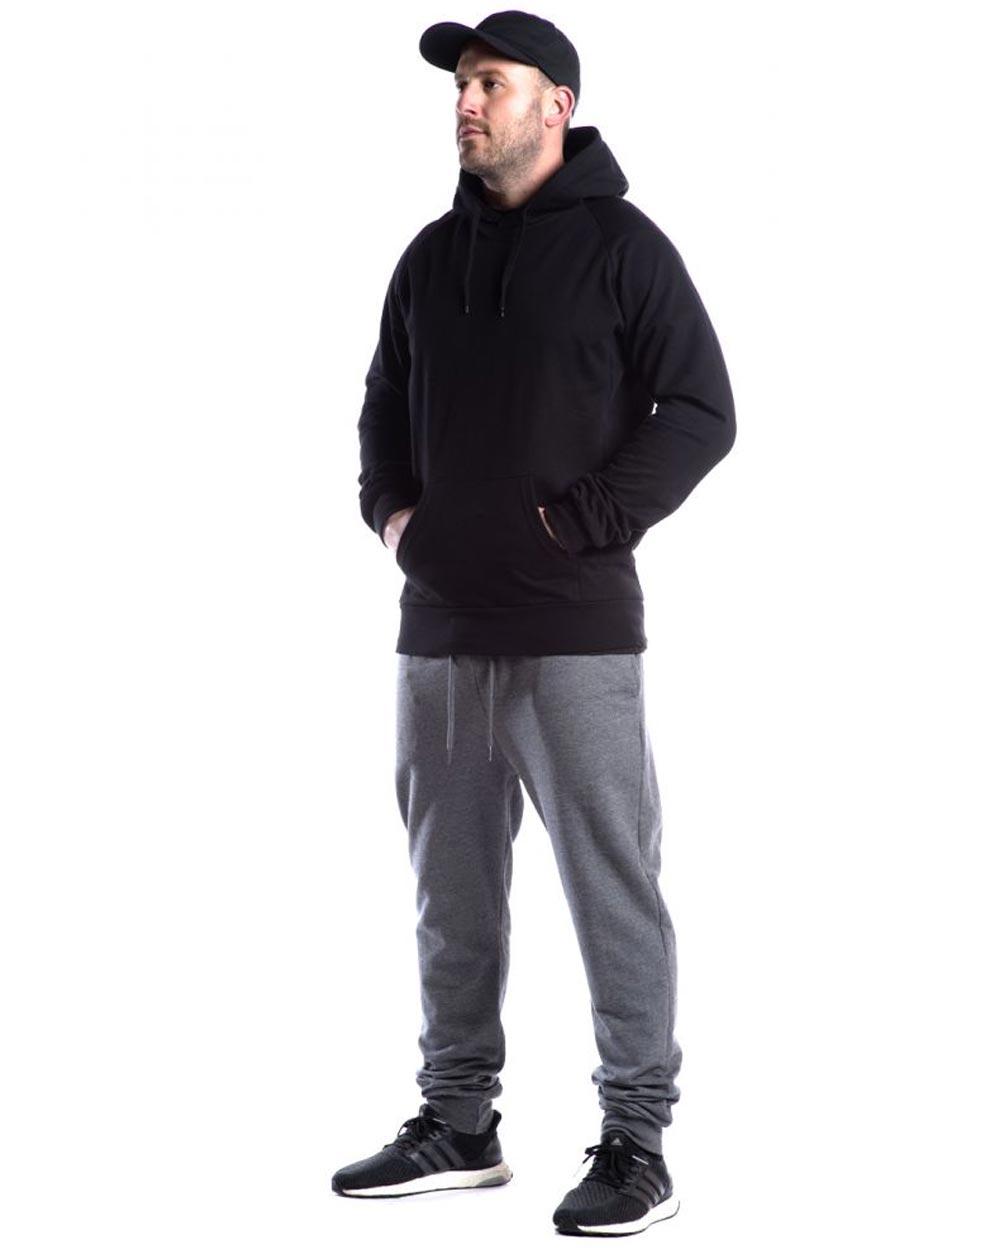 HS Apparel Hooded Pullover Sweatshirt